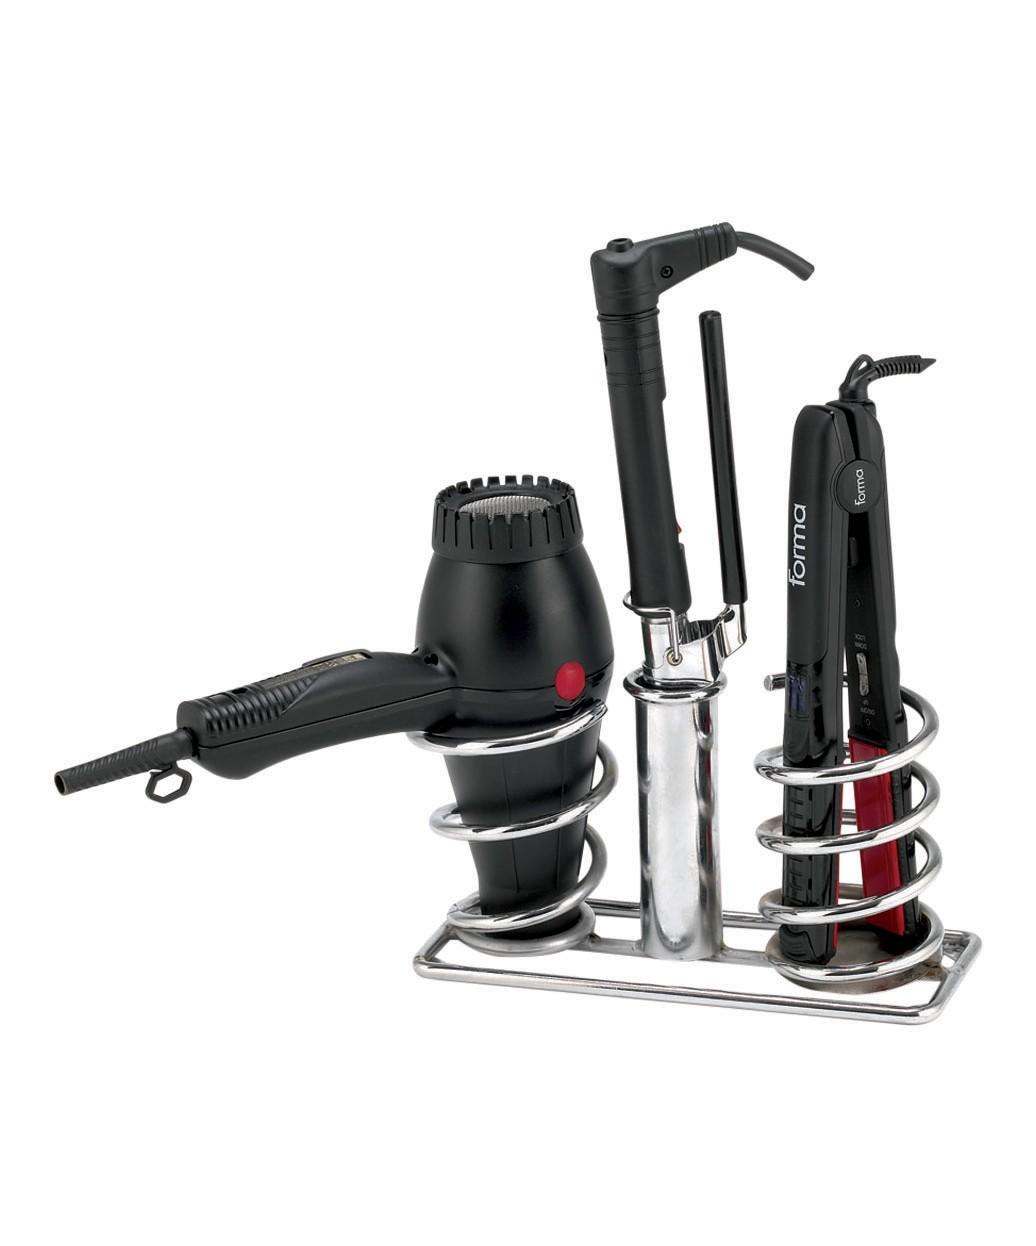 Pibbs 1555 Double Twist Appliance Holder